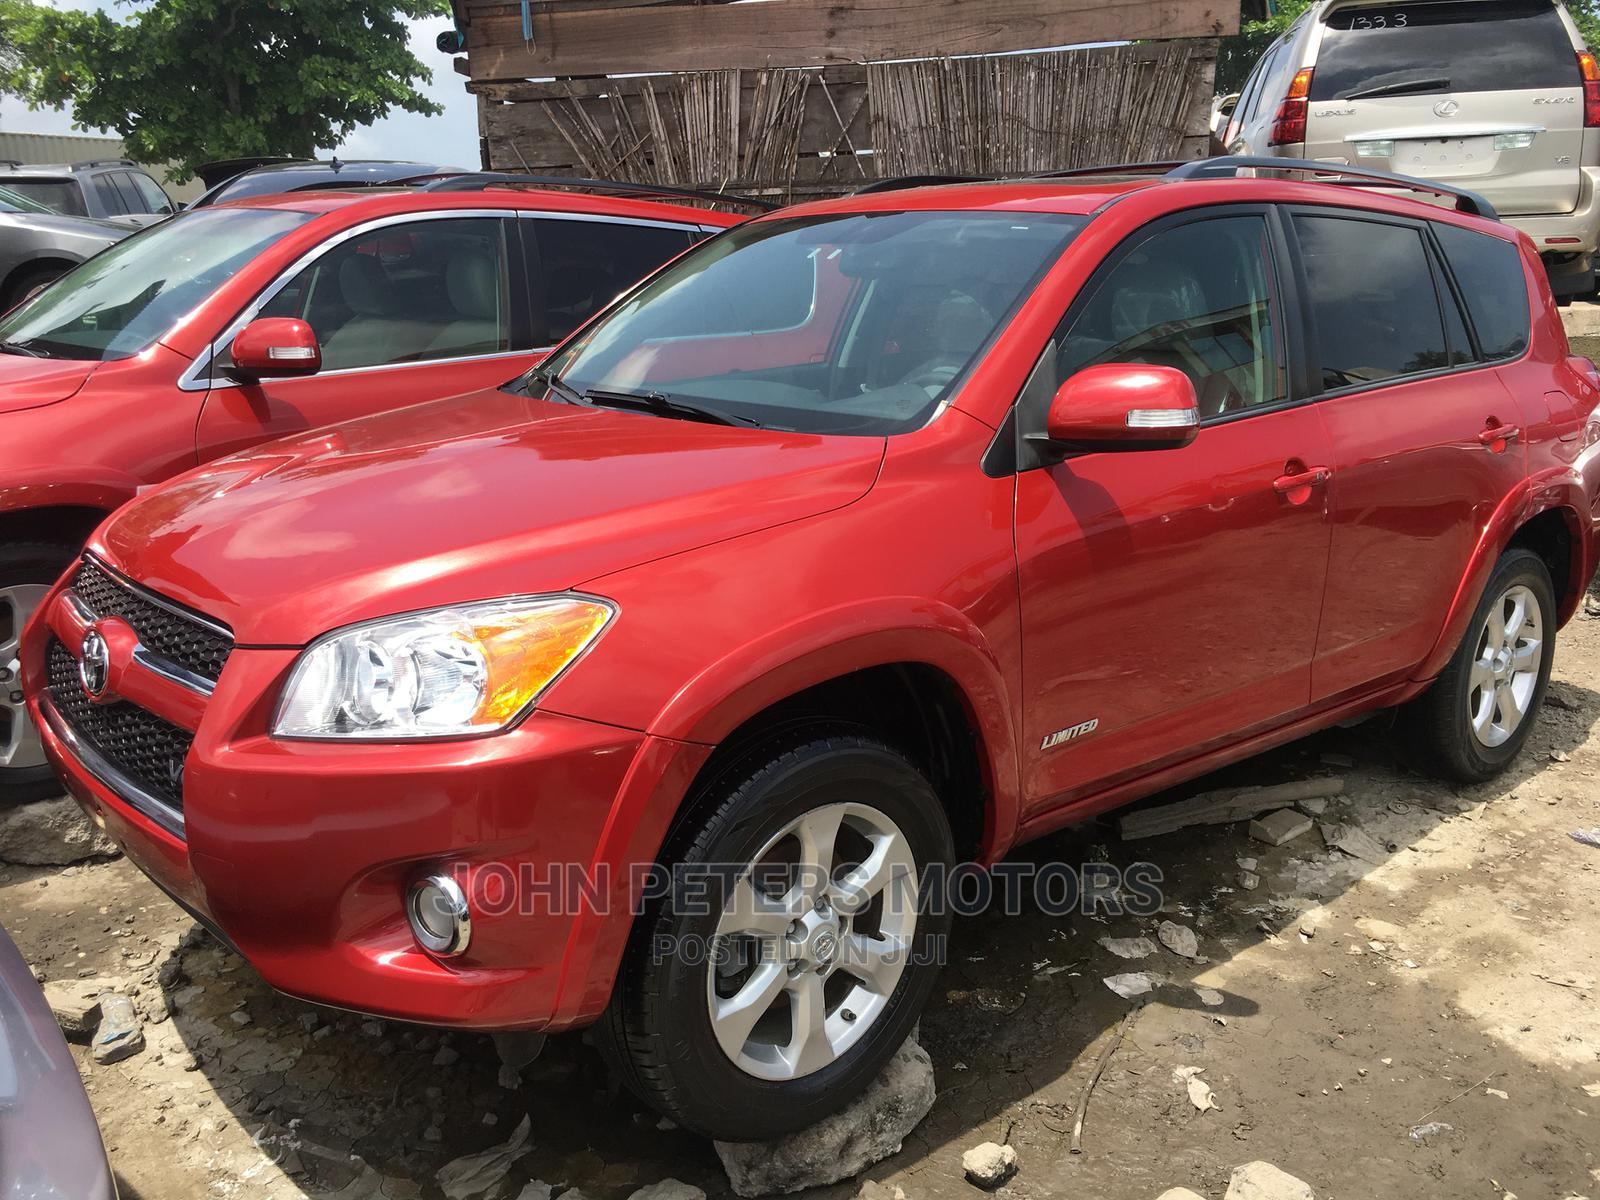 Toyota RAV4 2012 3.5 Limited 4x4 Red